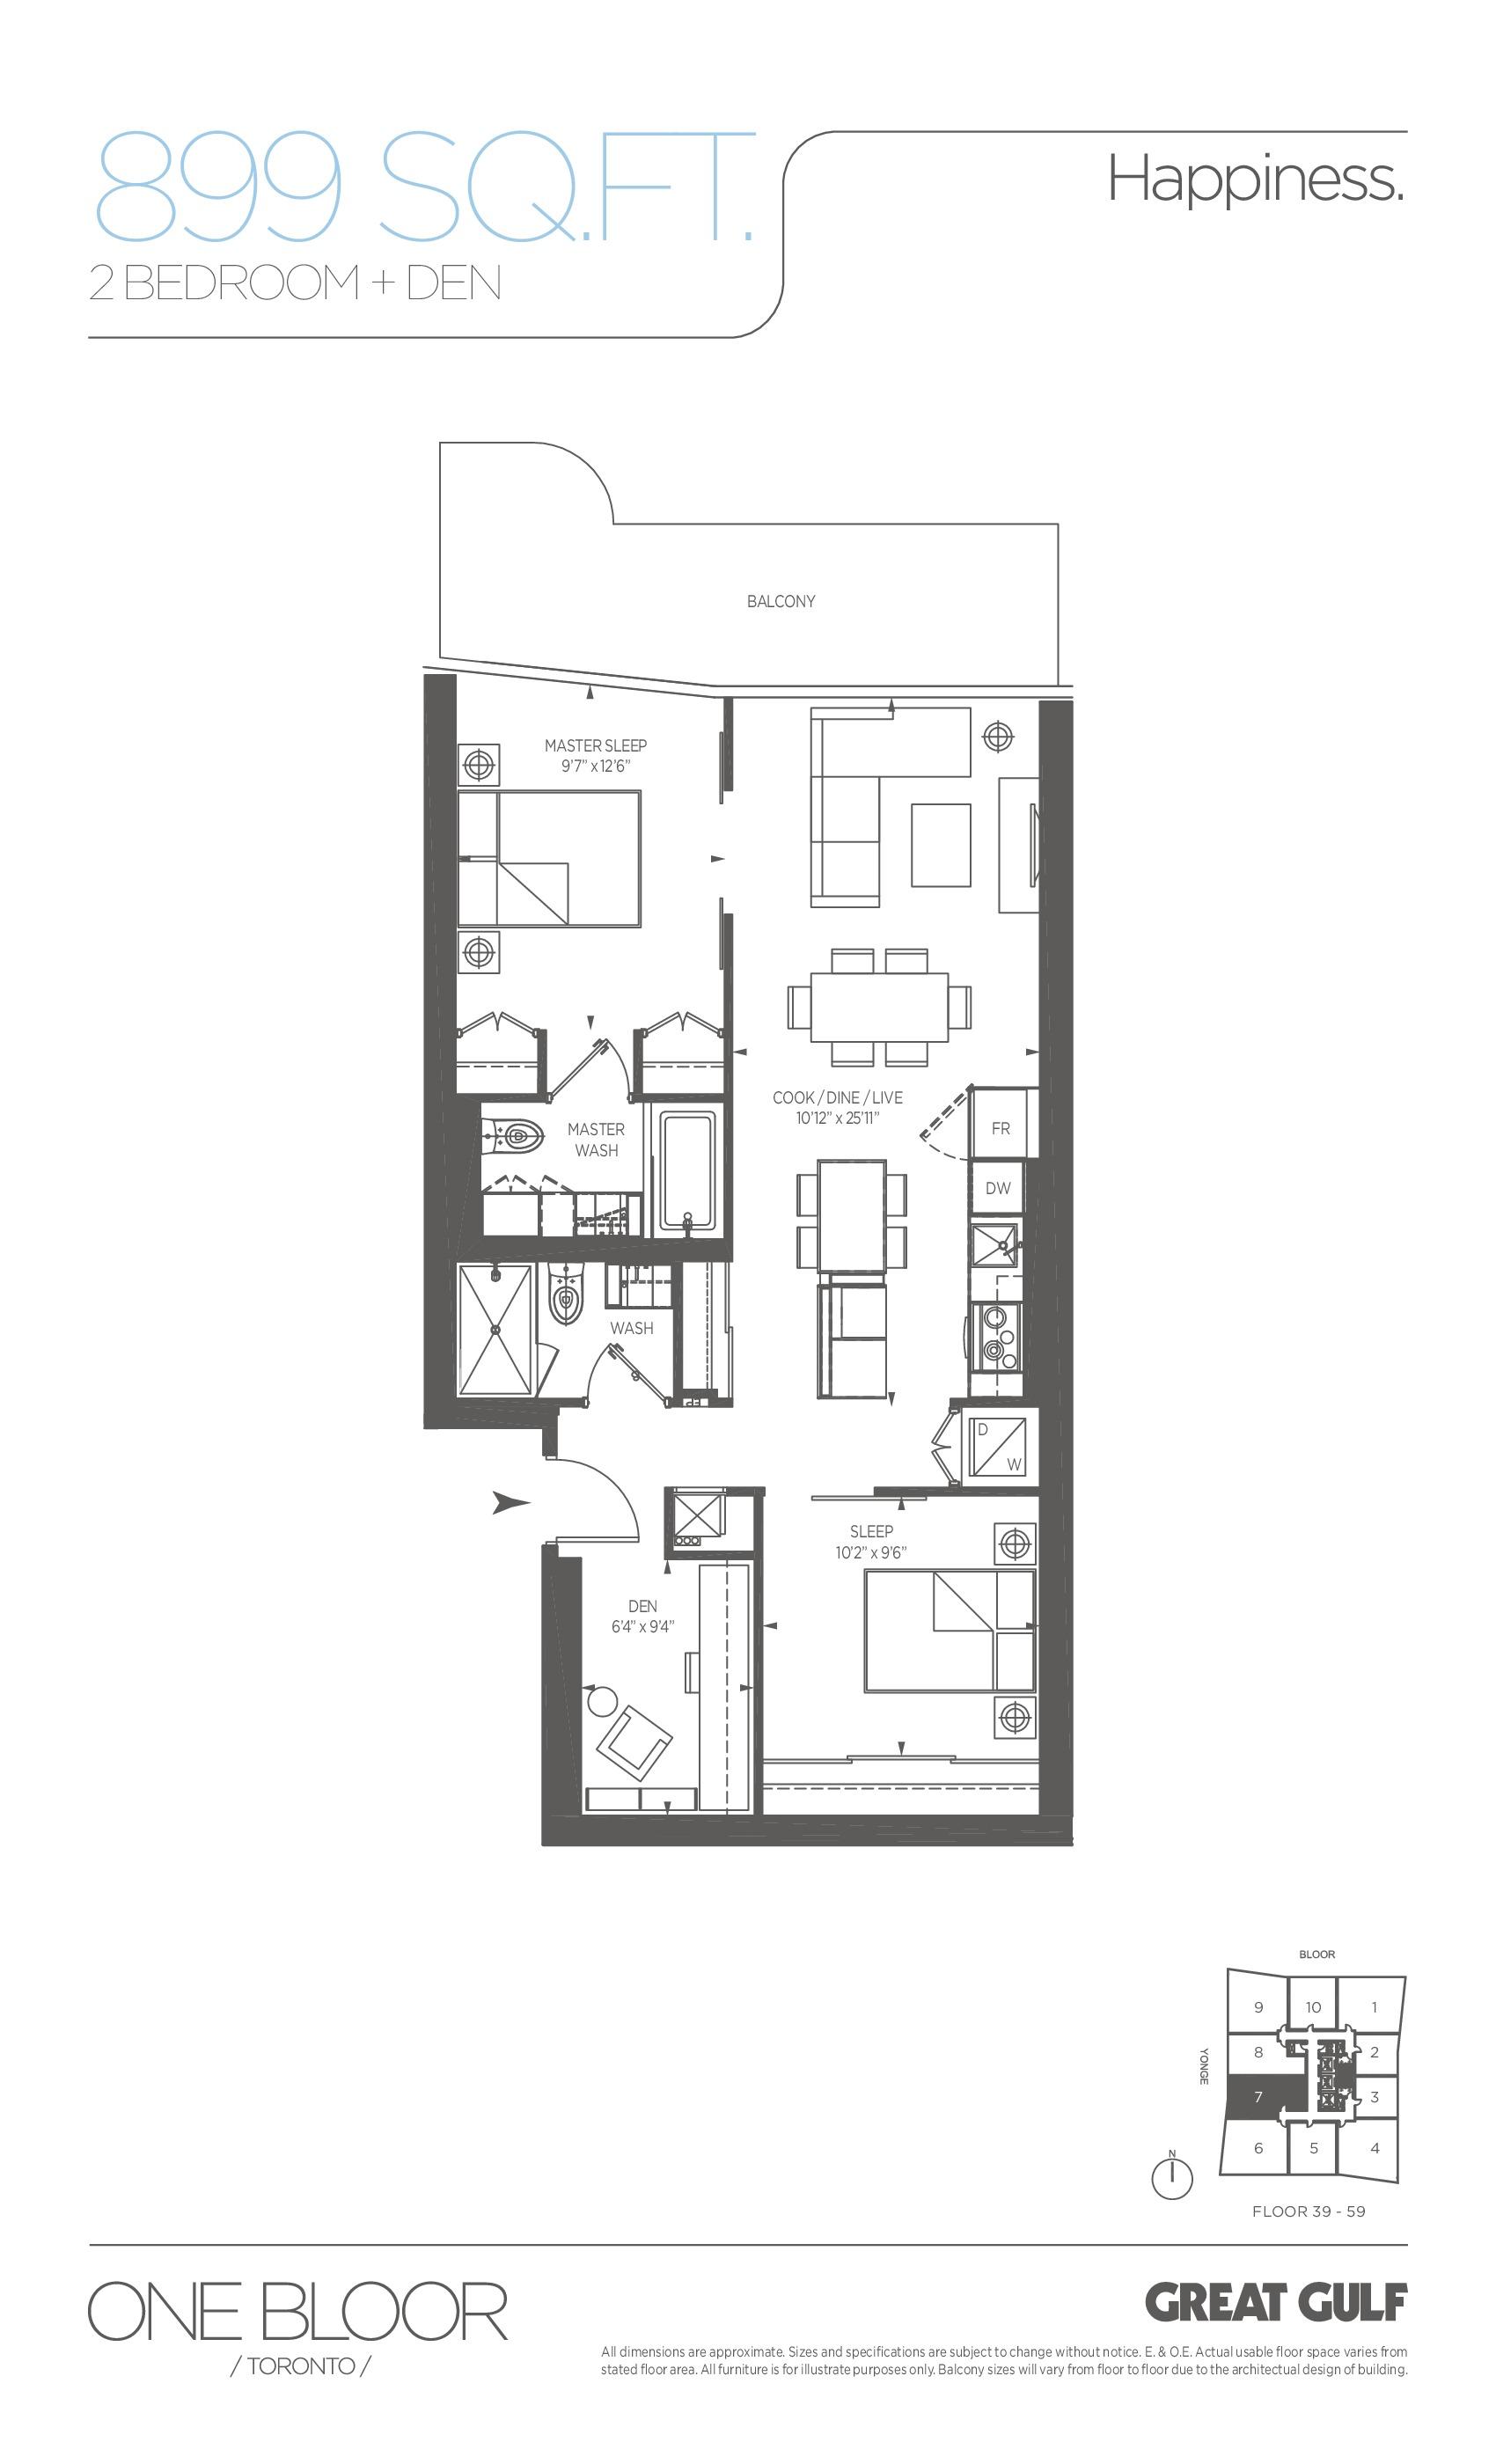 Happiness Floor Plan at One Bloor Condos - 899 sq.ft